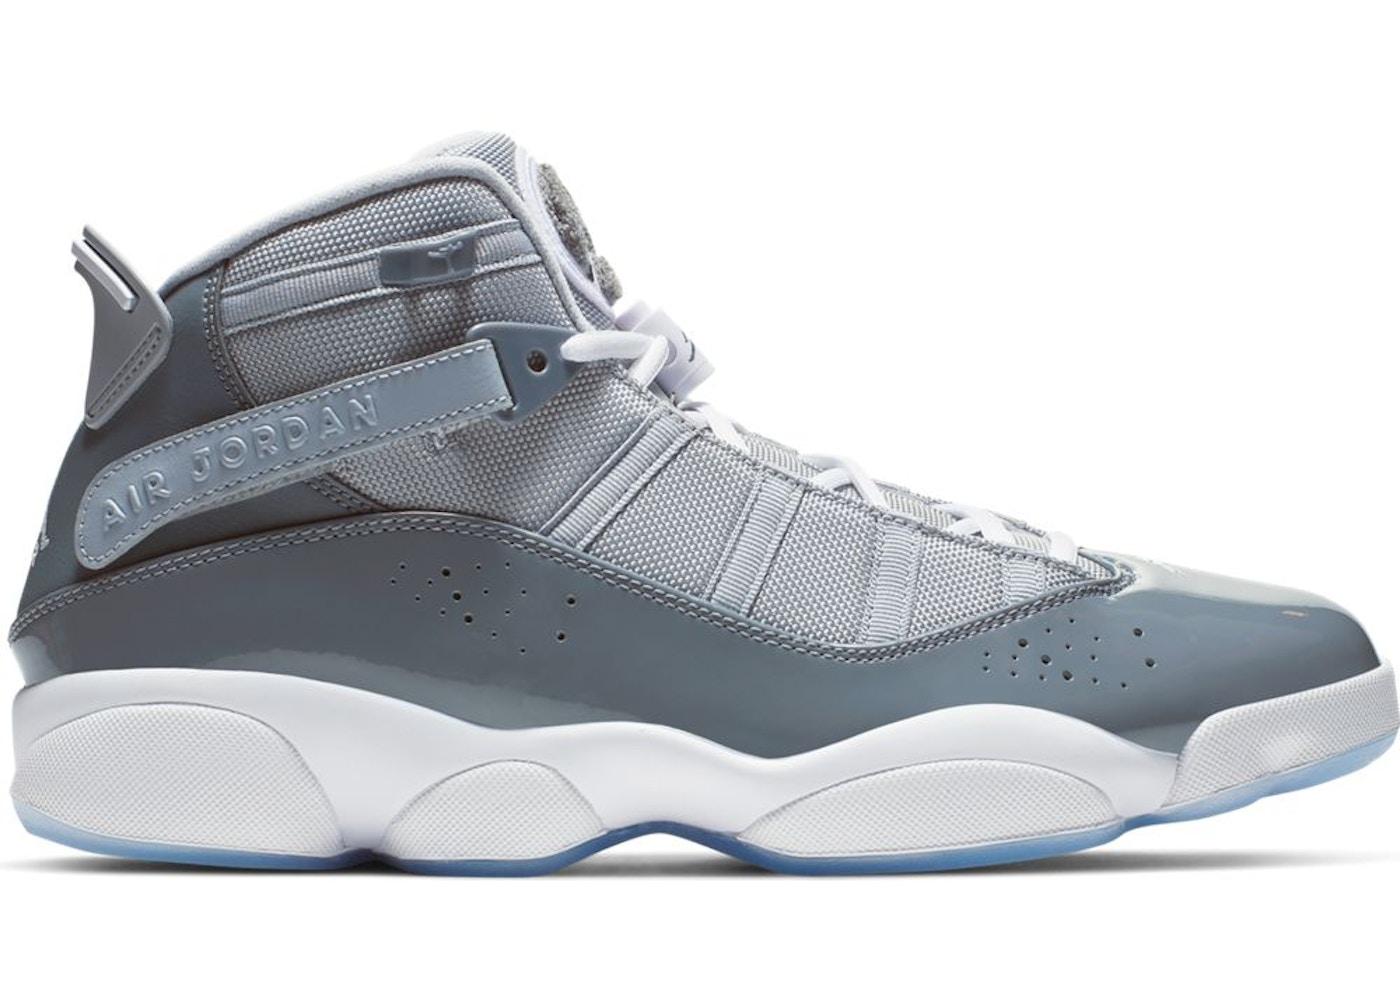 sports shoes e17c6 31605 Jordan 6 Rings Cool Grey White